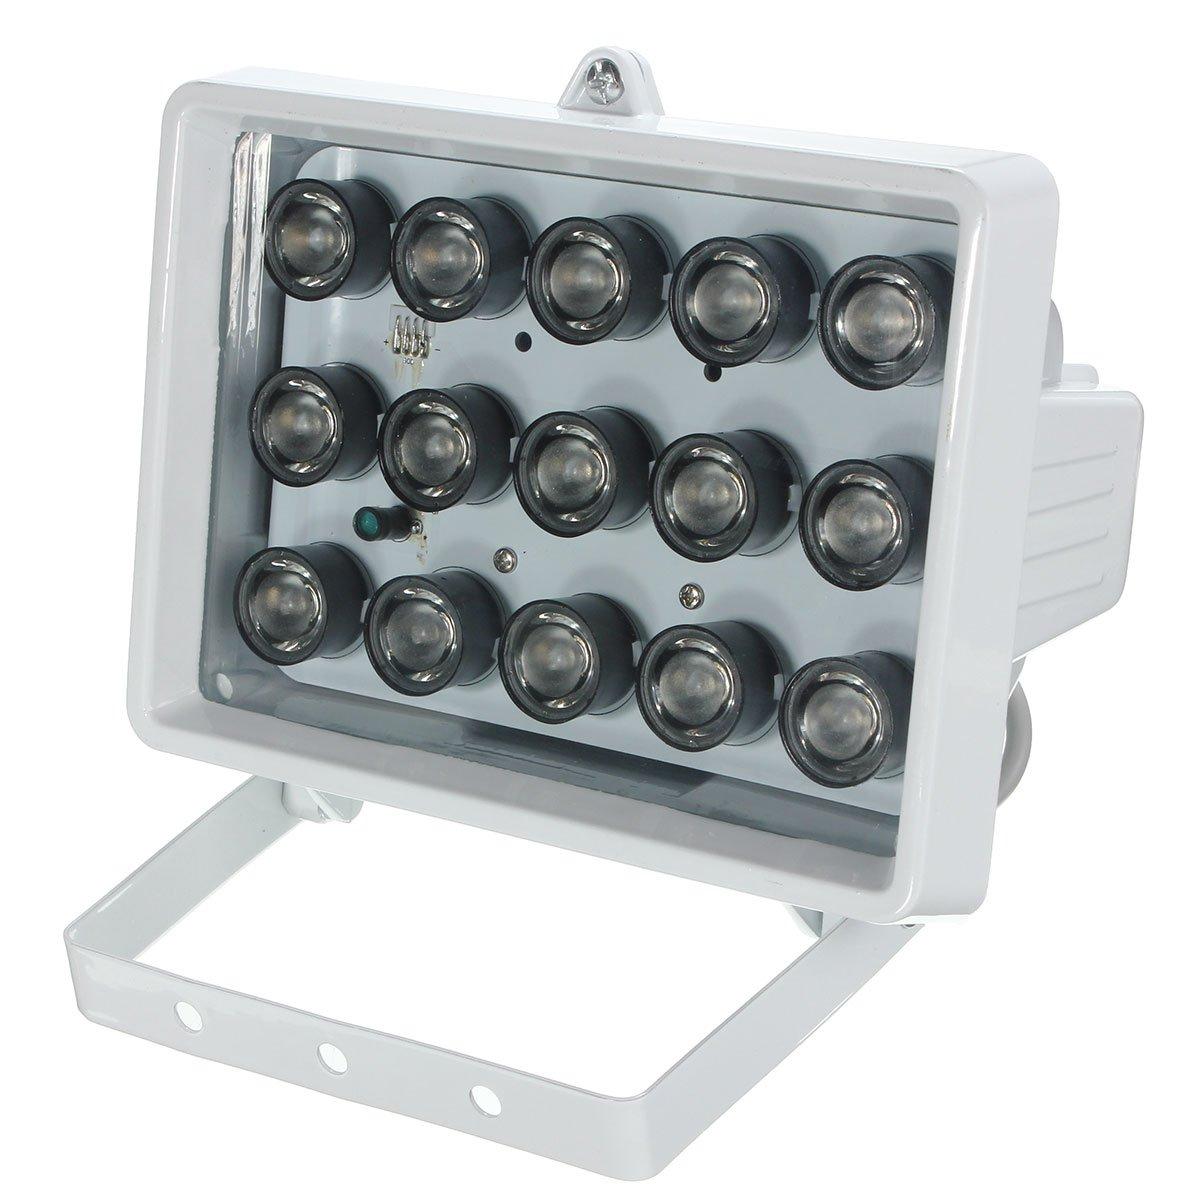 RISHIL WORLD 328ft 15LED 12V Night Vision Lamp IR Illuminator Infrared Light for Security Camera